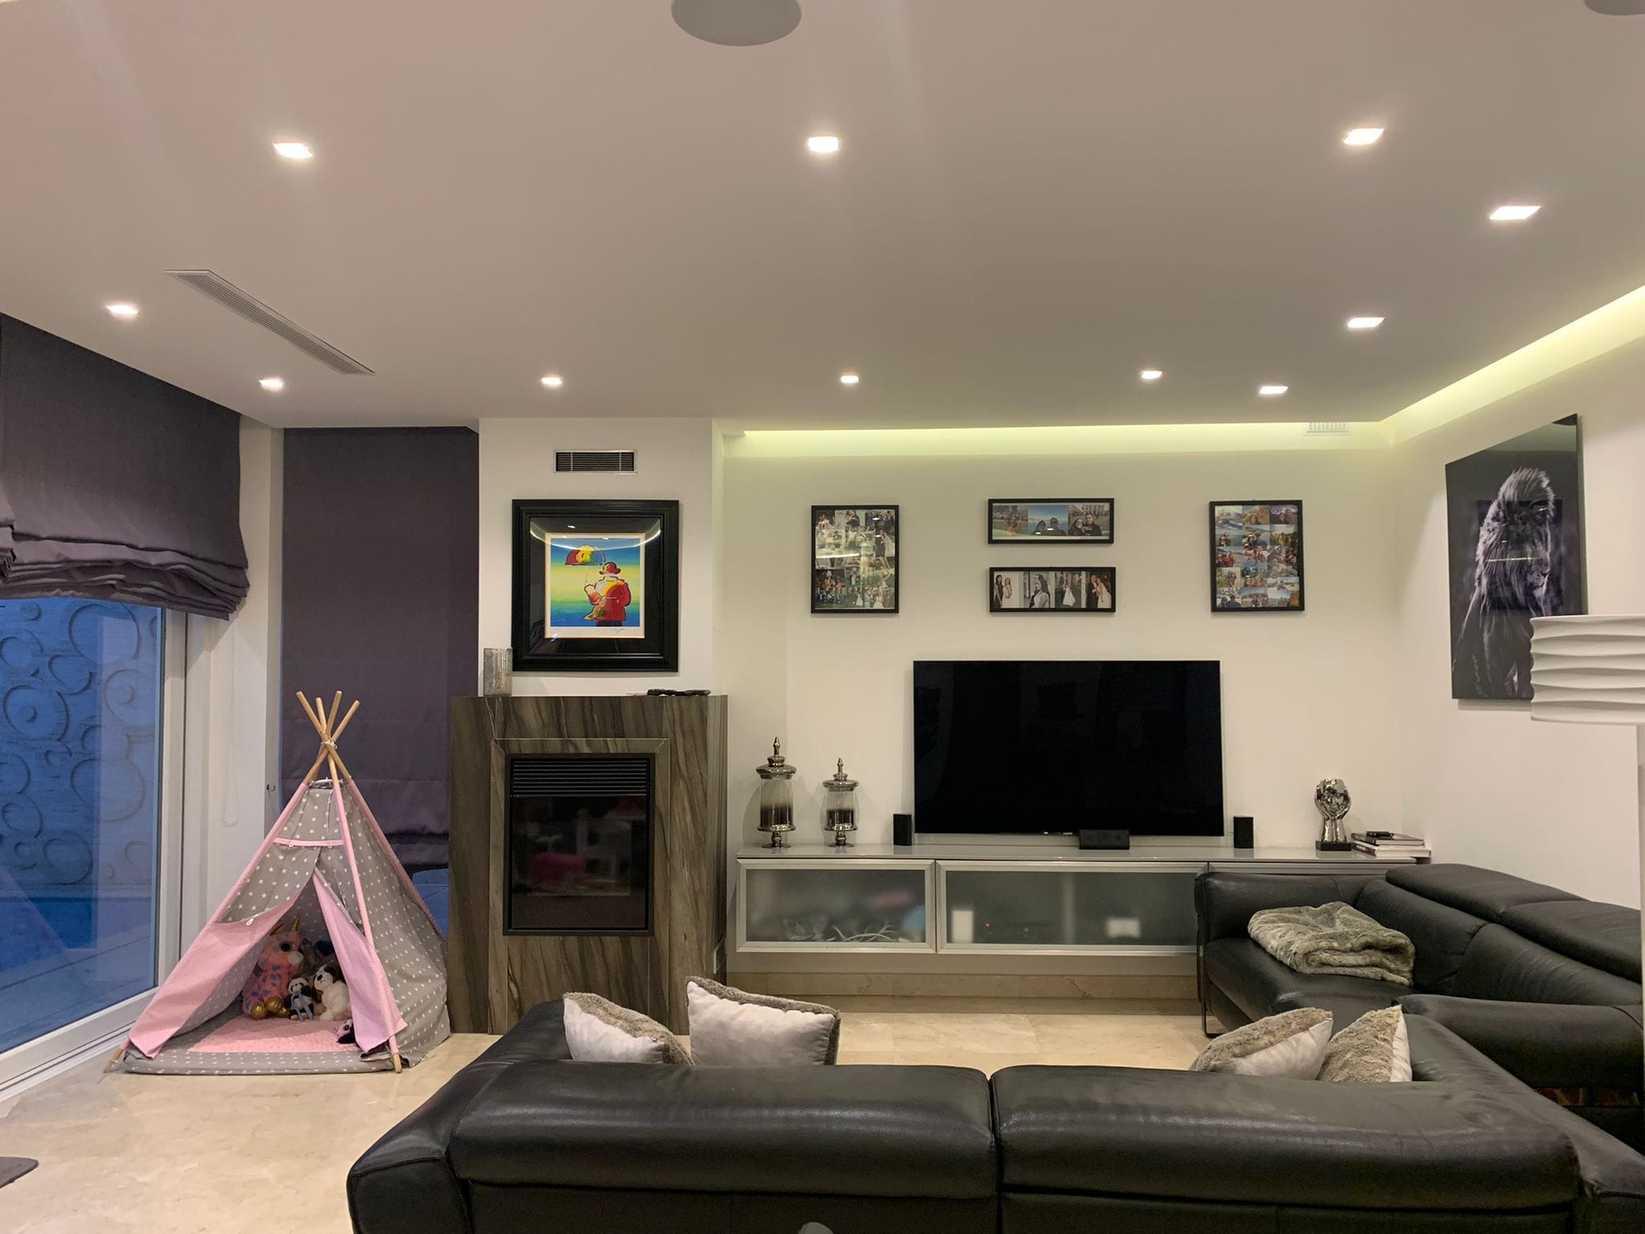 4 bed Villa For Rent in Ibragg, Ibragg - thumb 2